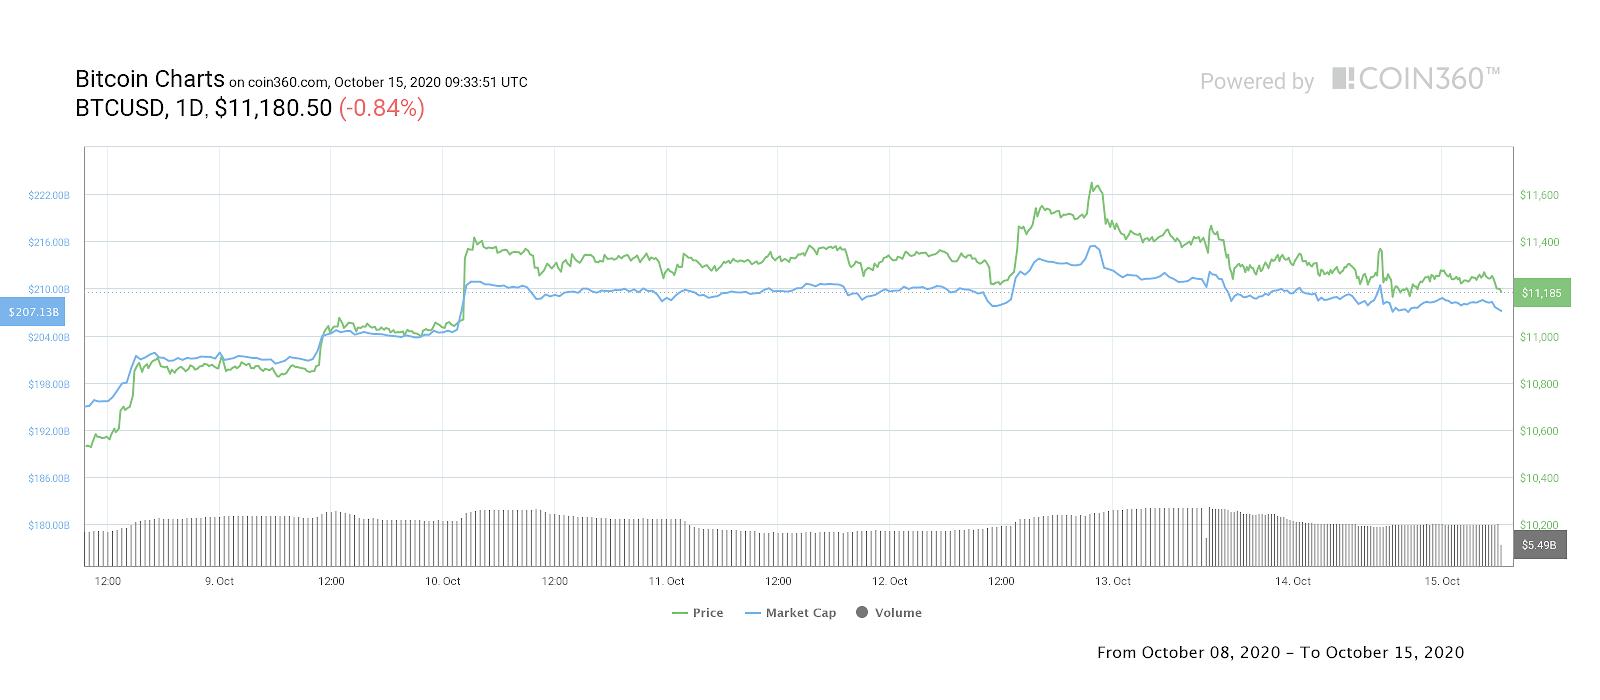 BTC/USD 1-week daily price chart